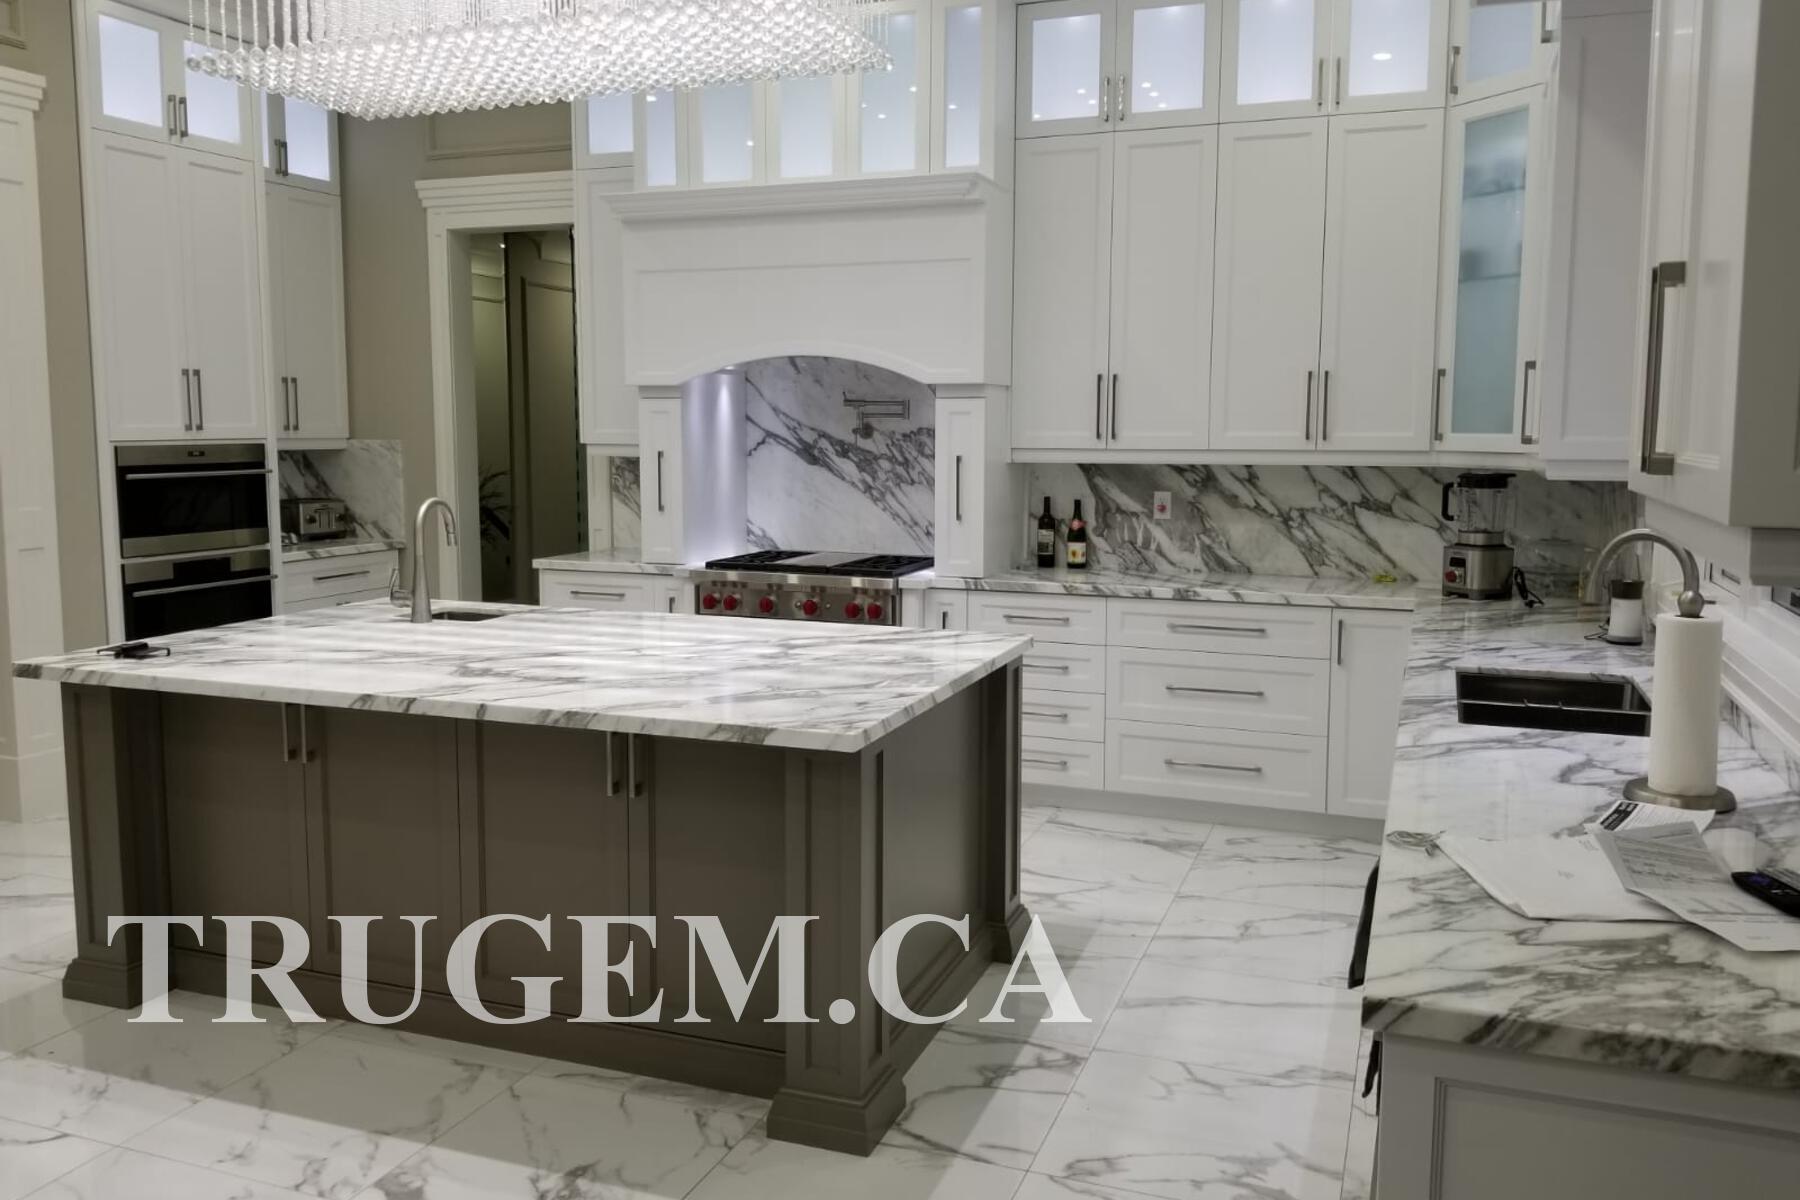 Renovate with classic design